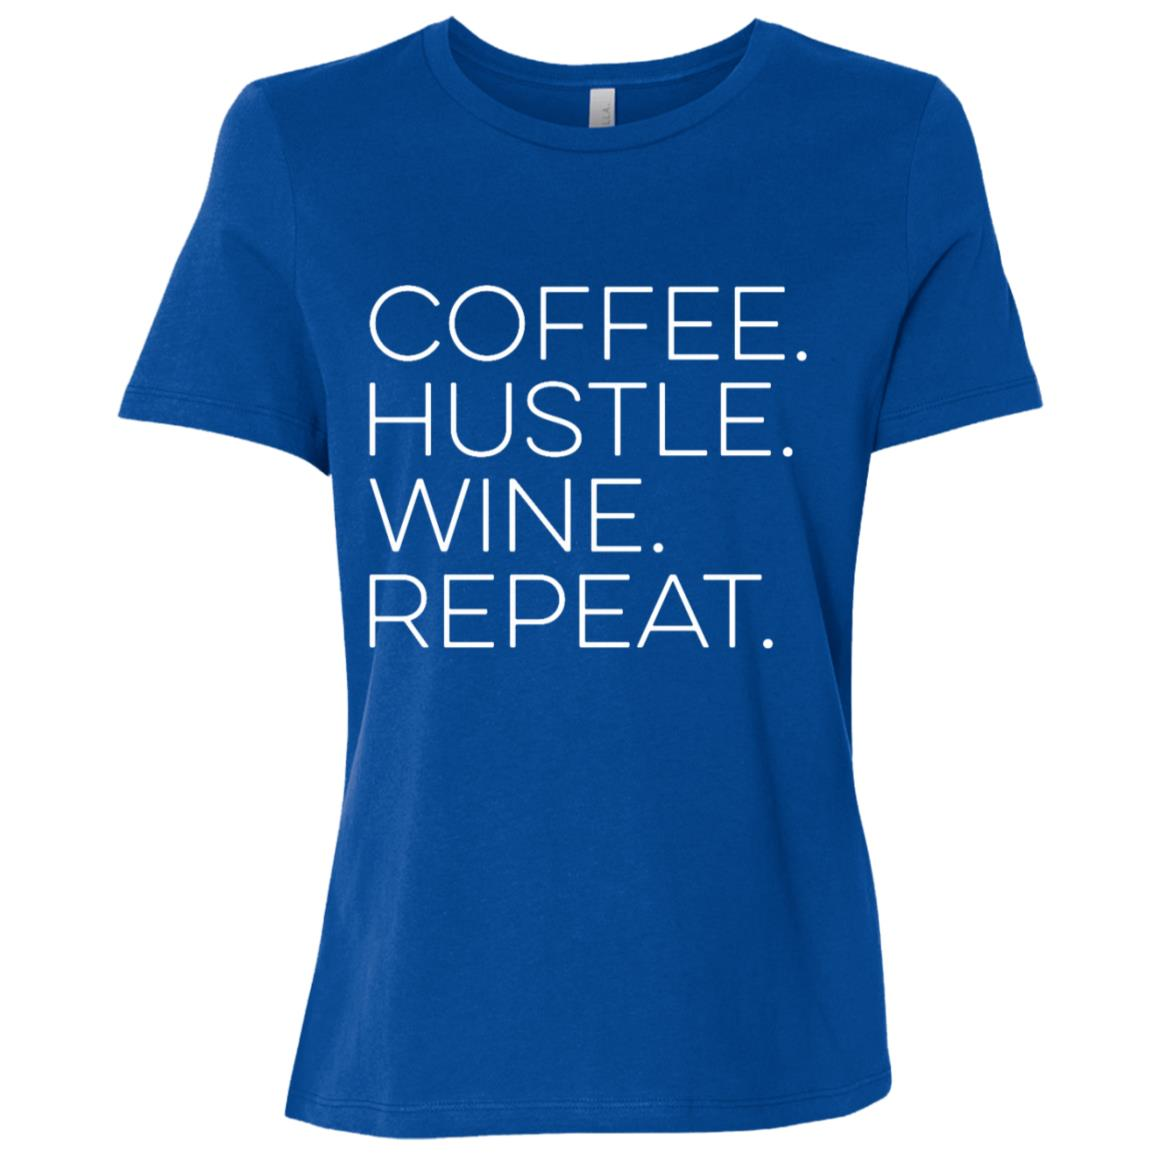 Entrepreneur Coffee. Hustle. Wine. Repeat Women Short Sleeve T-Shirt